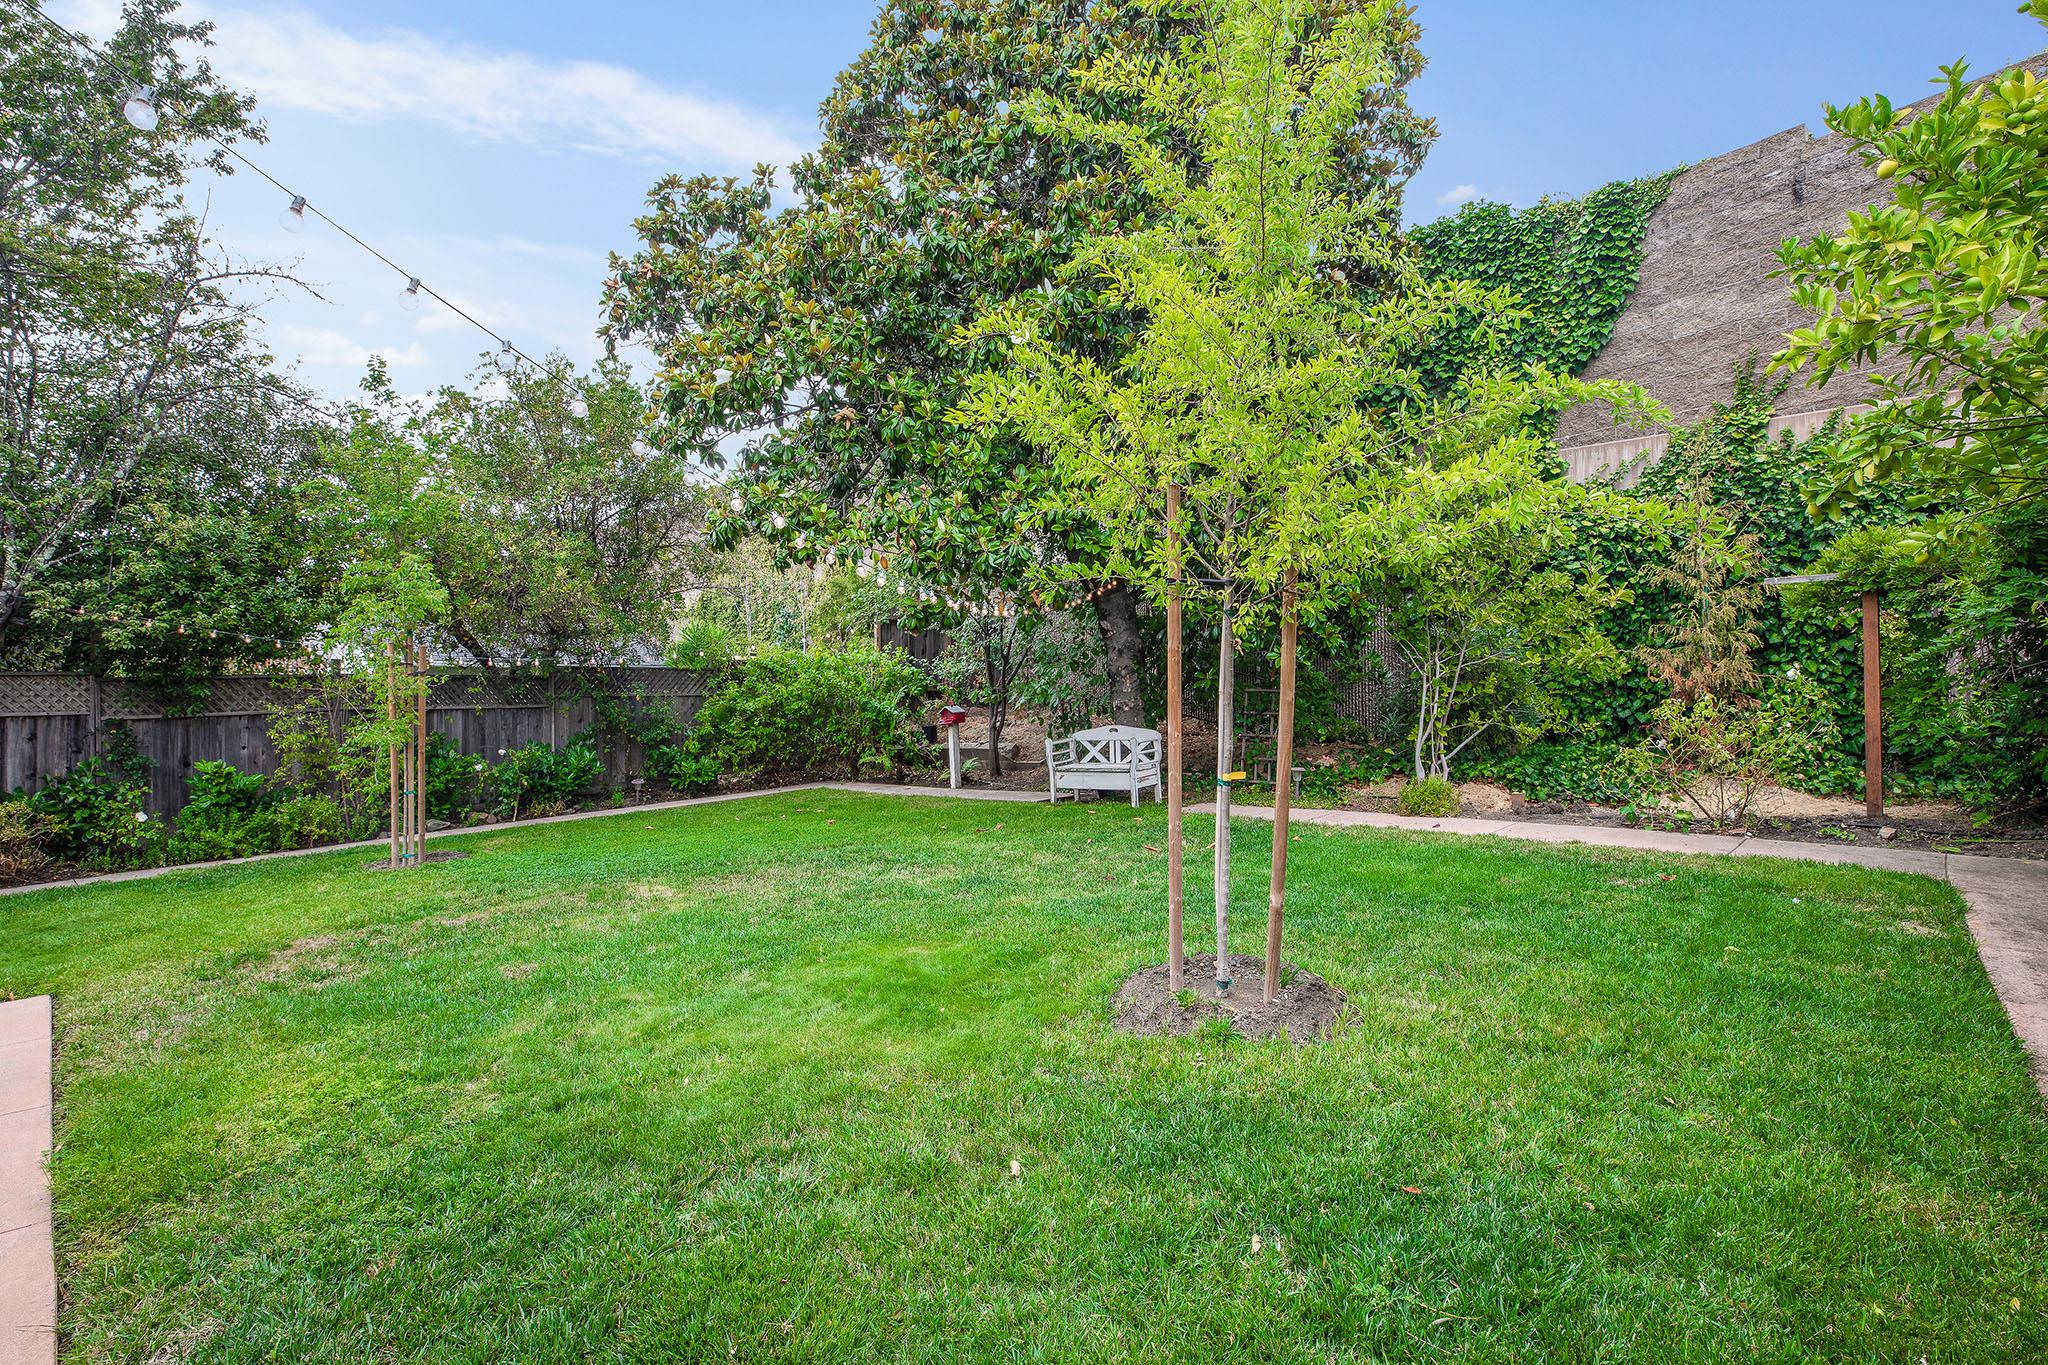 Backyard lawn - 3 to wall.jpg